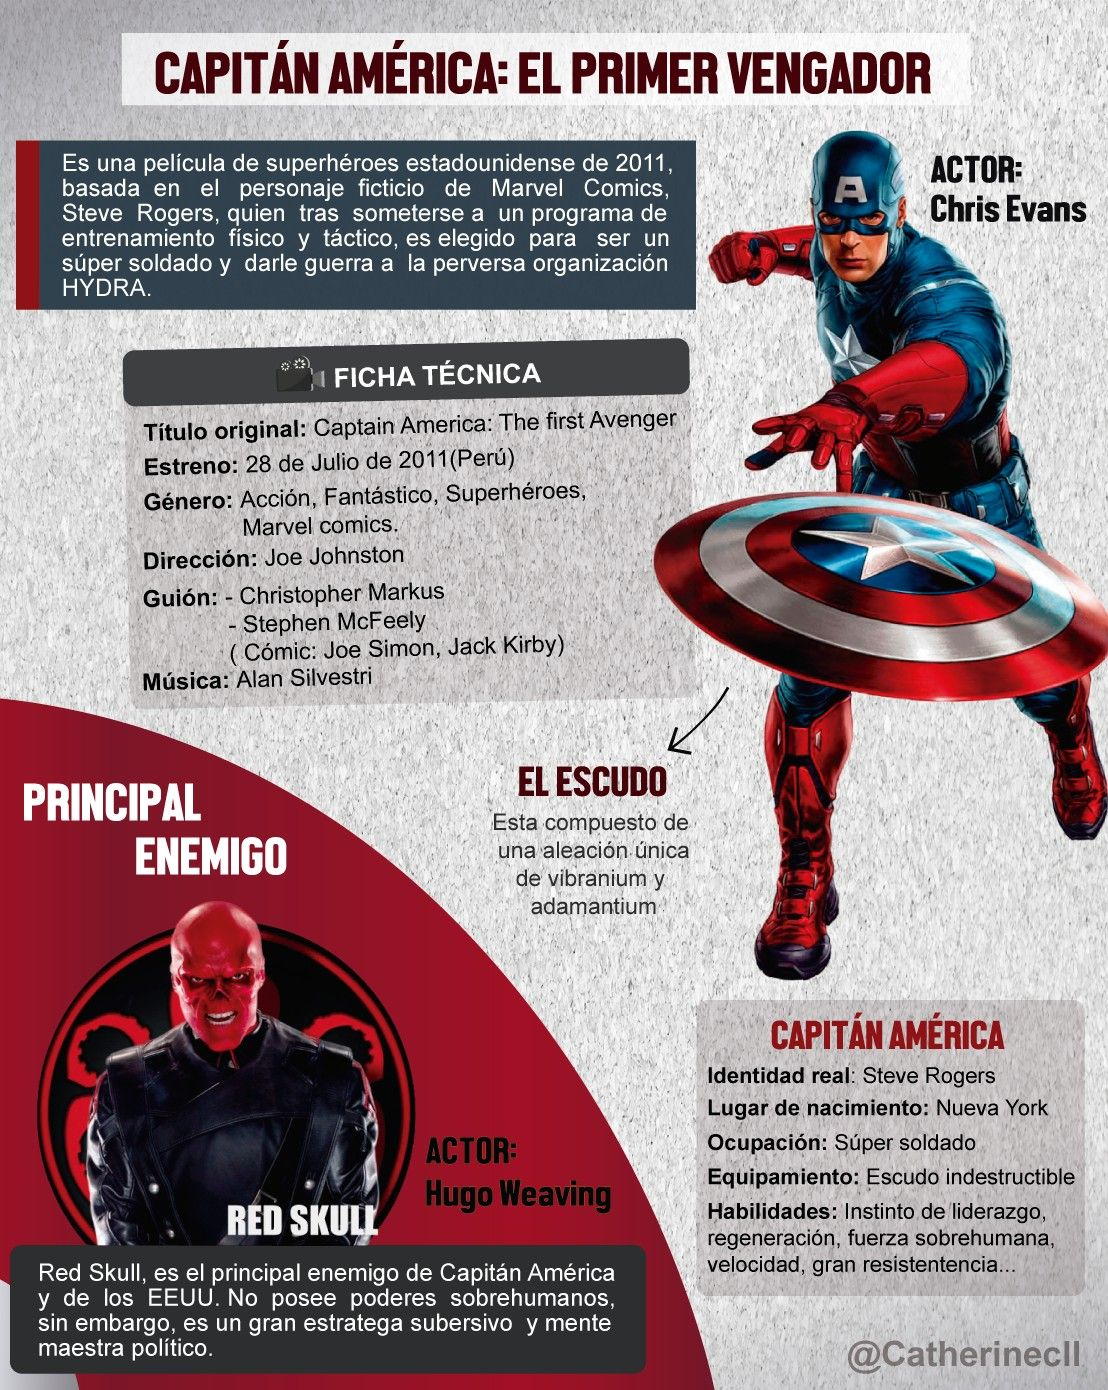 Capitan America El Primer Vengador In 2021 Marvel Movie Posters Poster